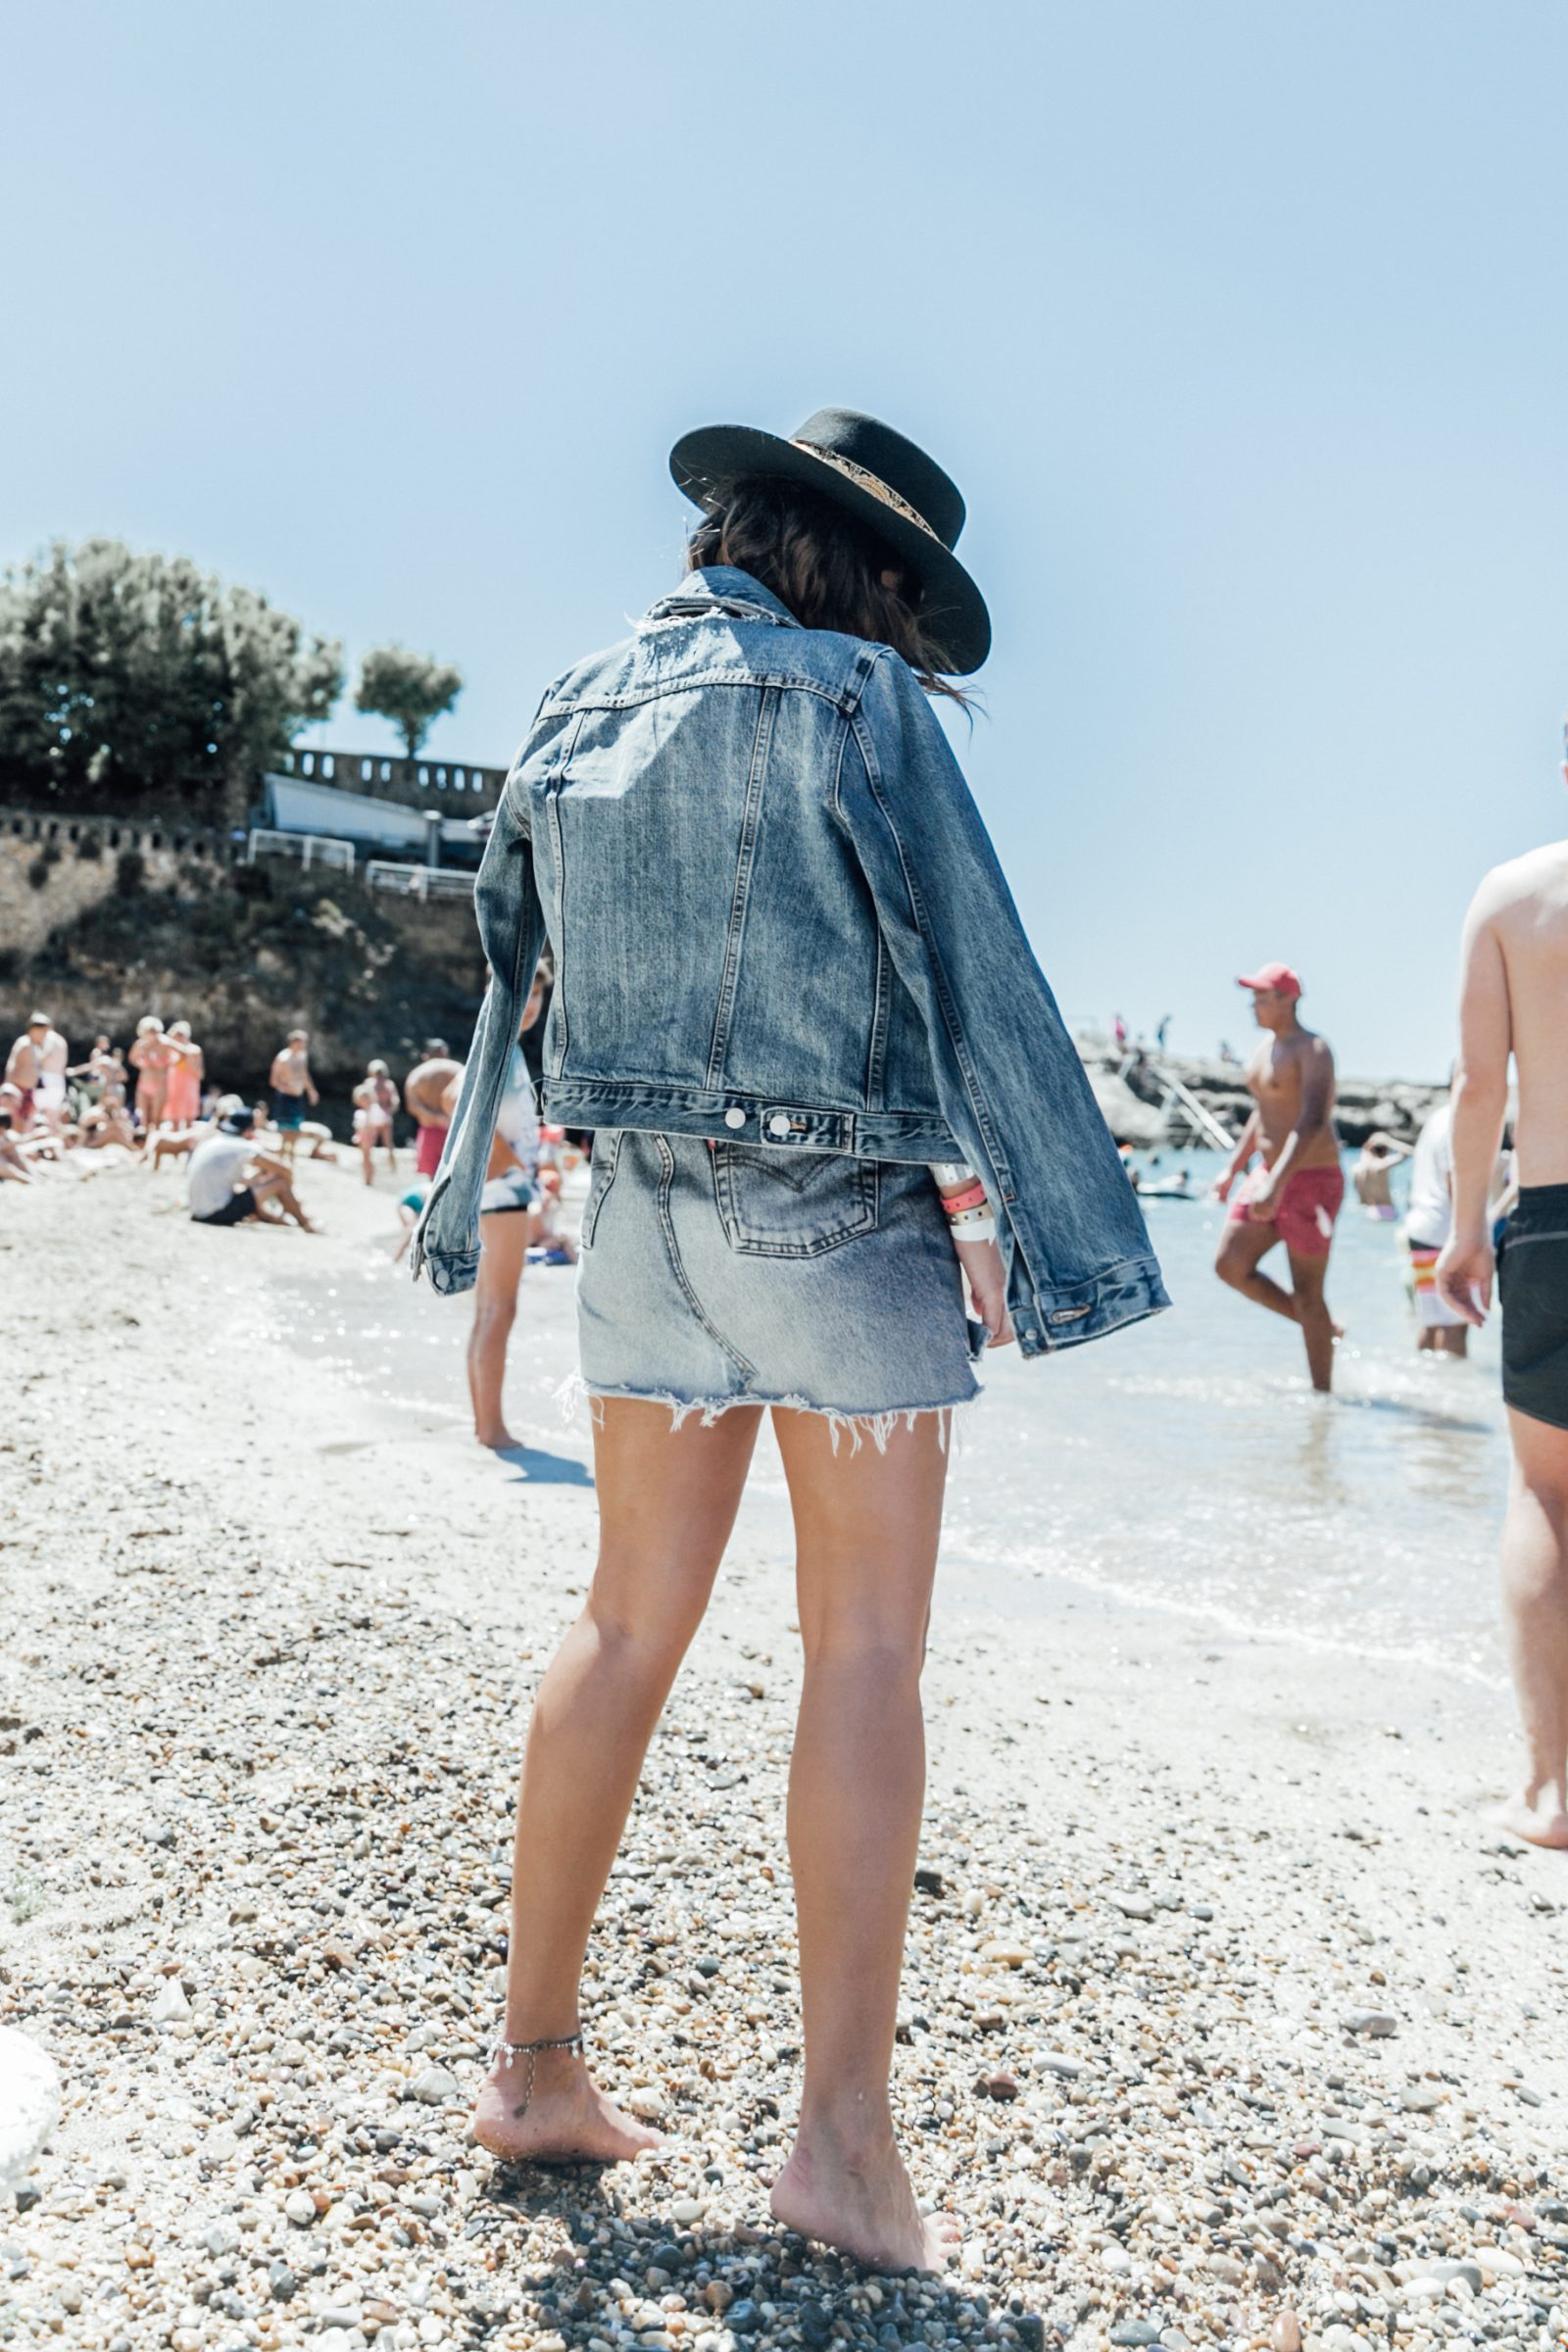 Biarritz-Big_Festival-Live_in_Levis-Double_Denim-Denim_Skirt-Denim_Jacket-Nude_Top-Lack_Of_Color_Hat-Outfit-Summer-Street_Style-30